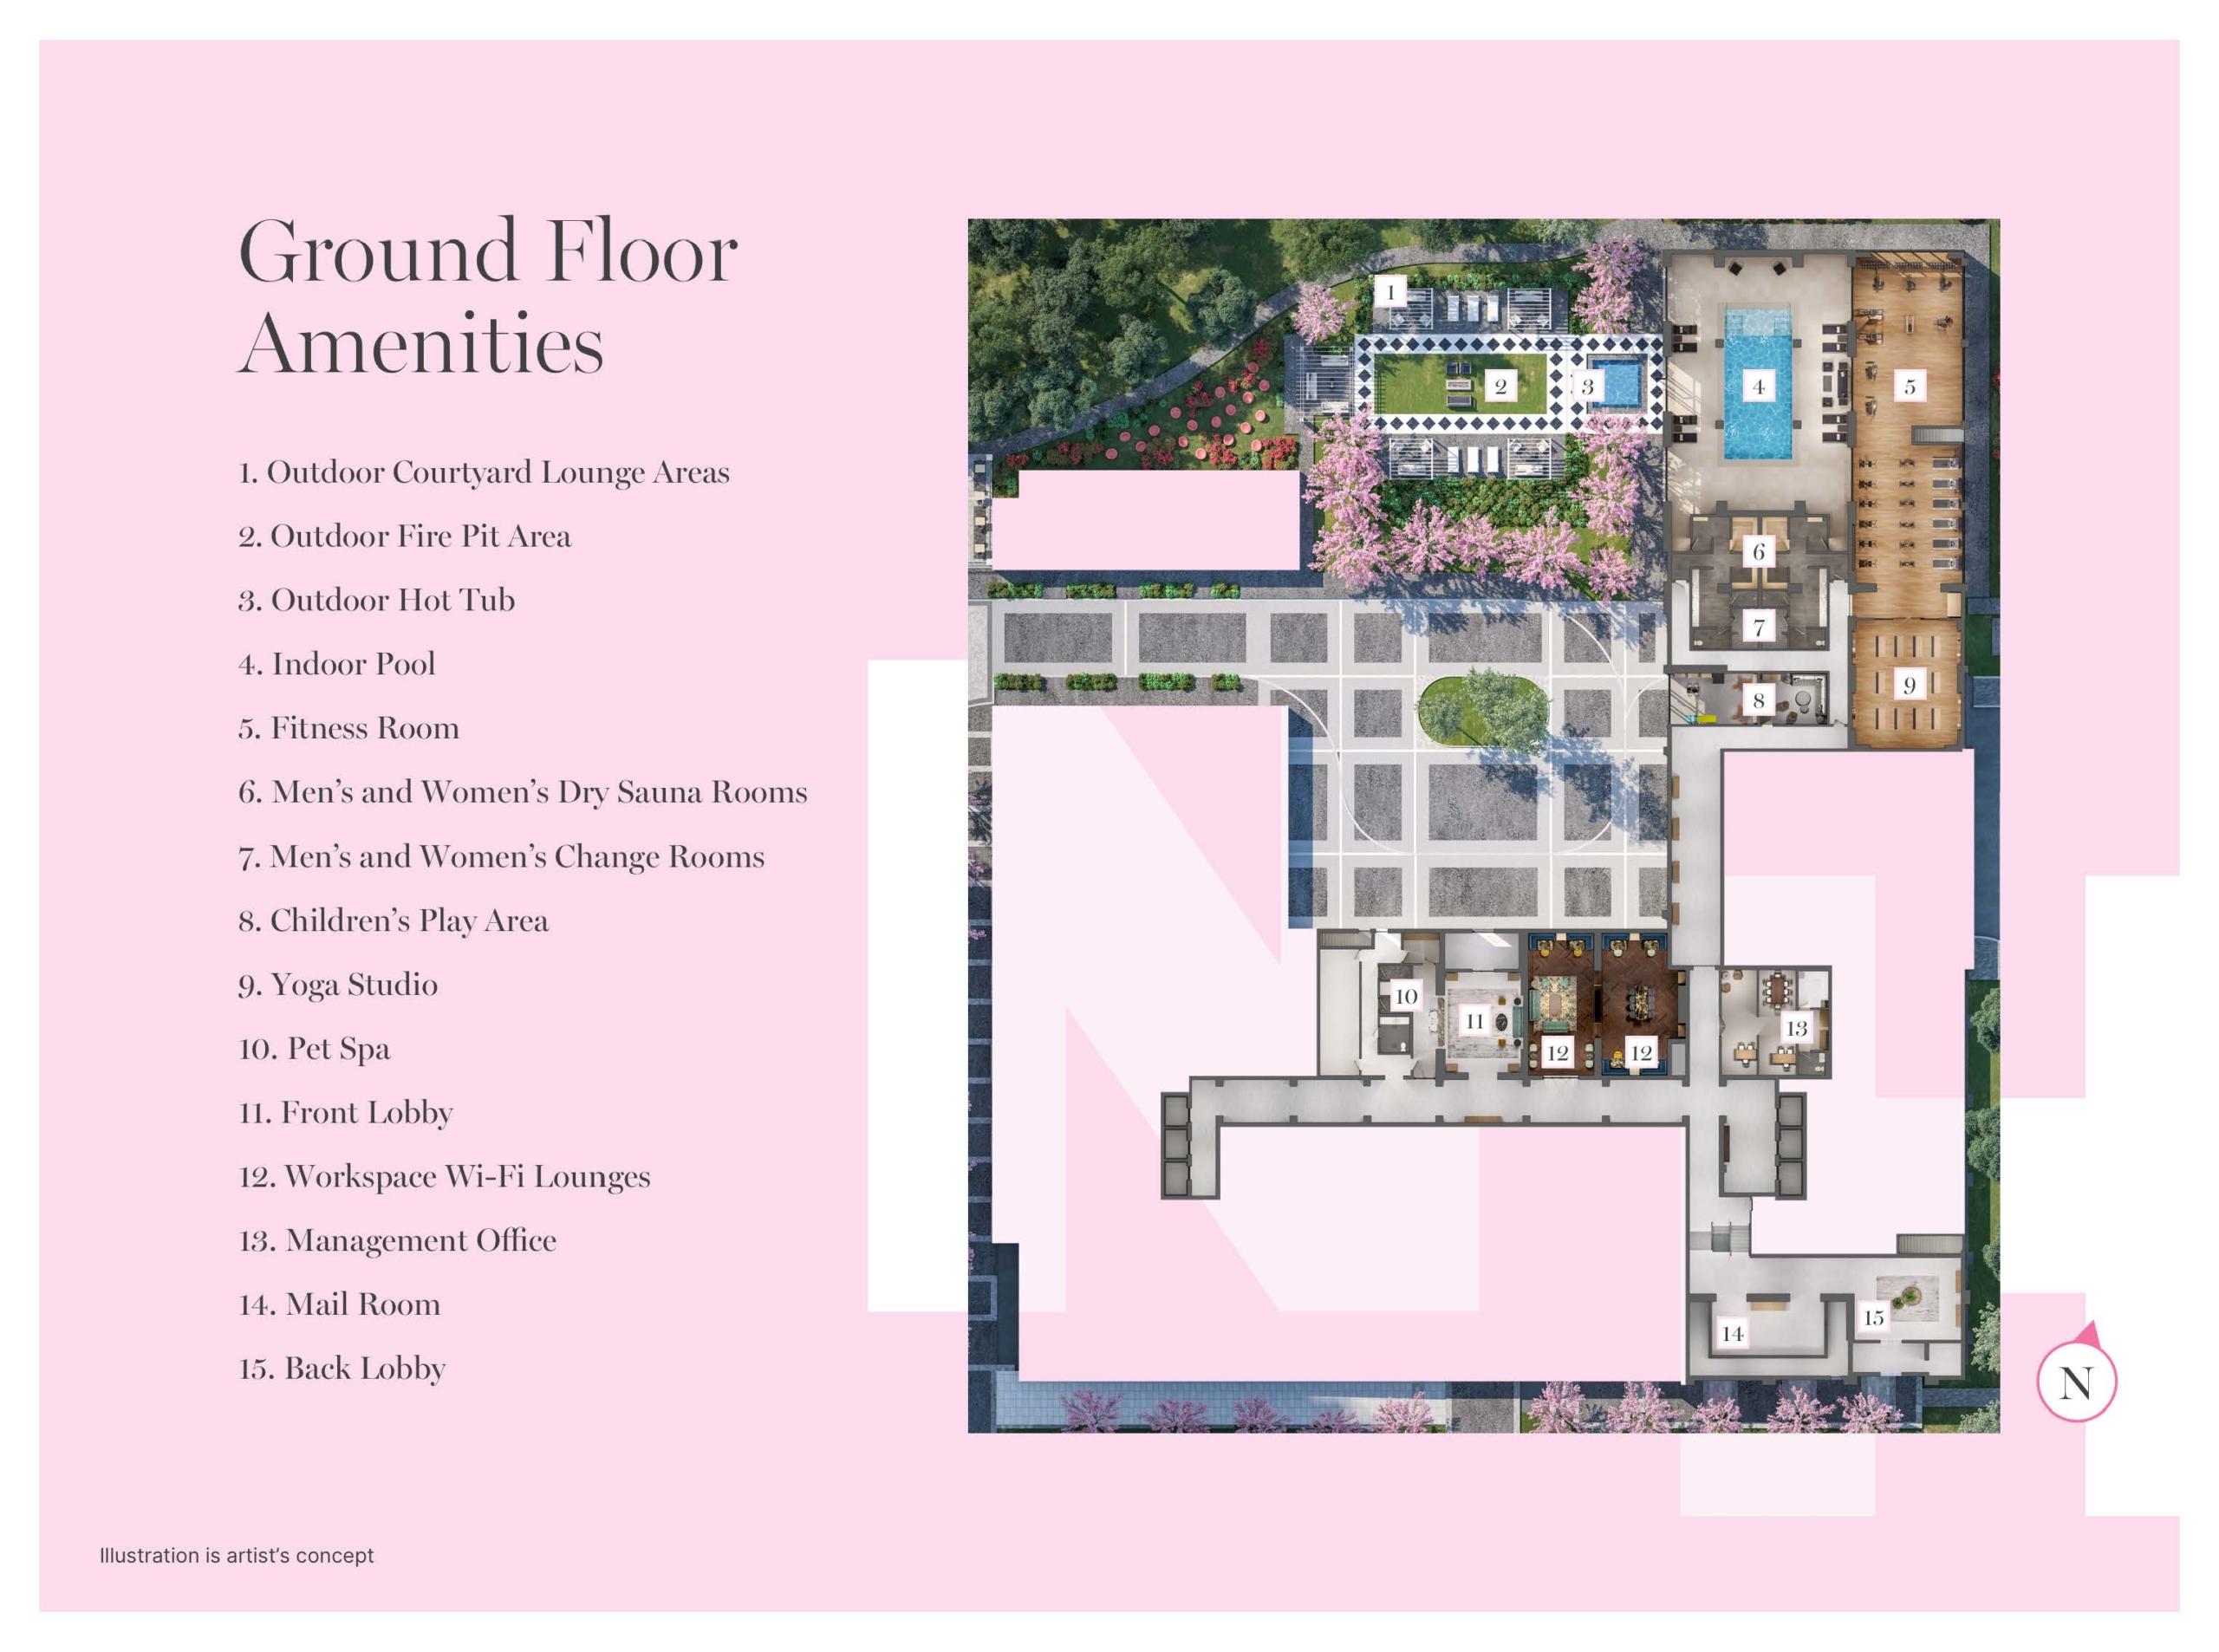 Sitemap of Notting Hill Condos ground floor amenities.